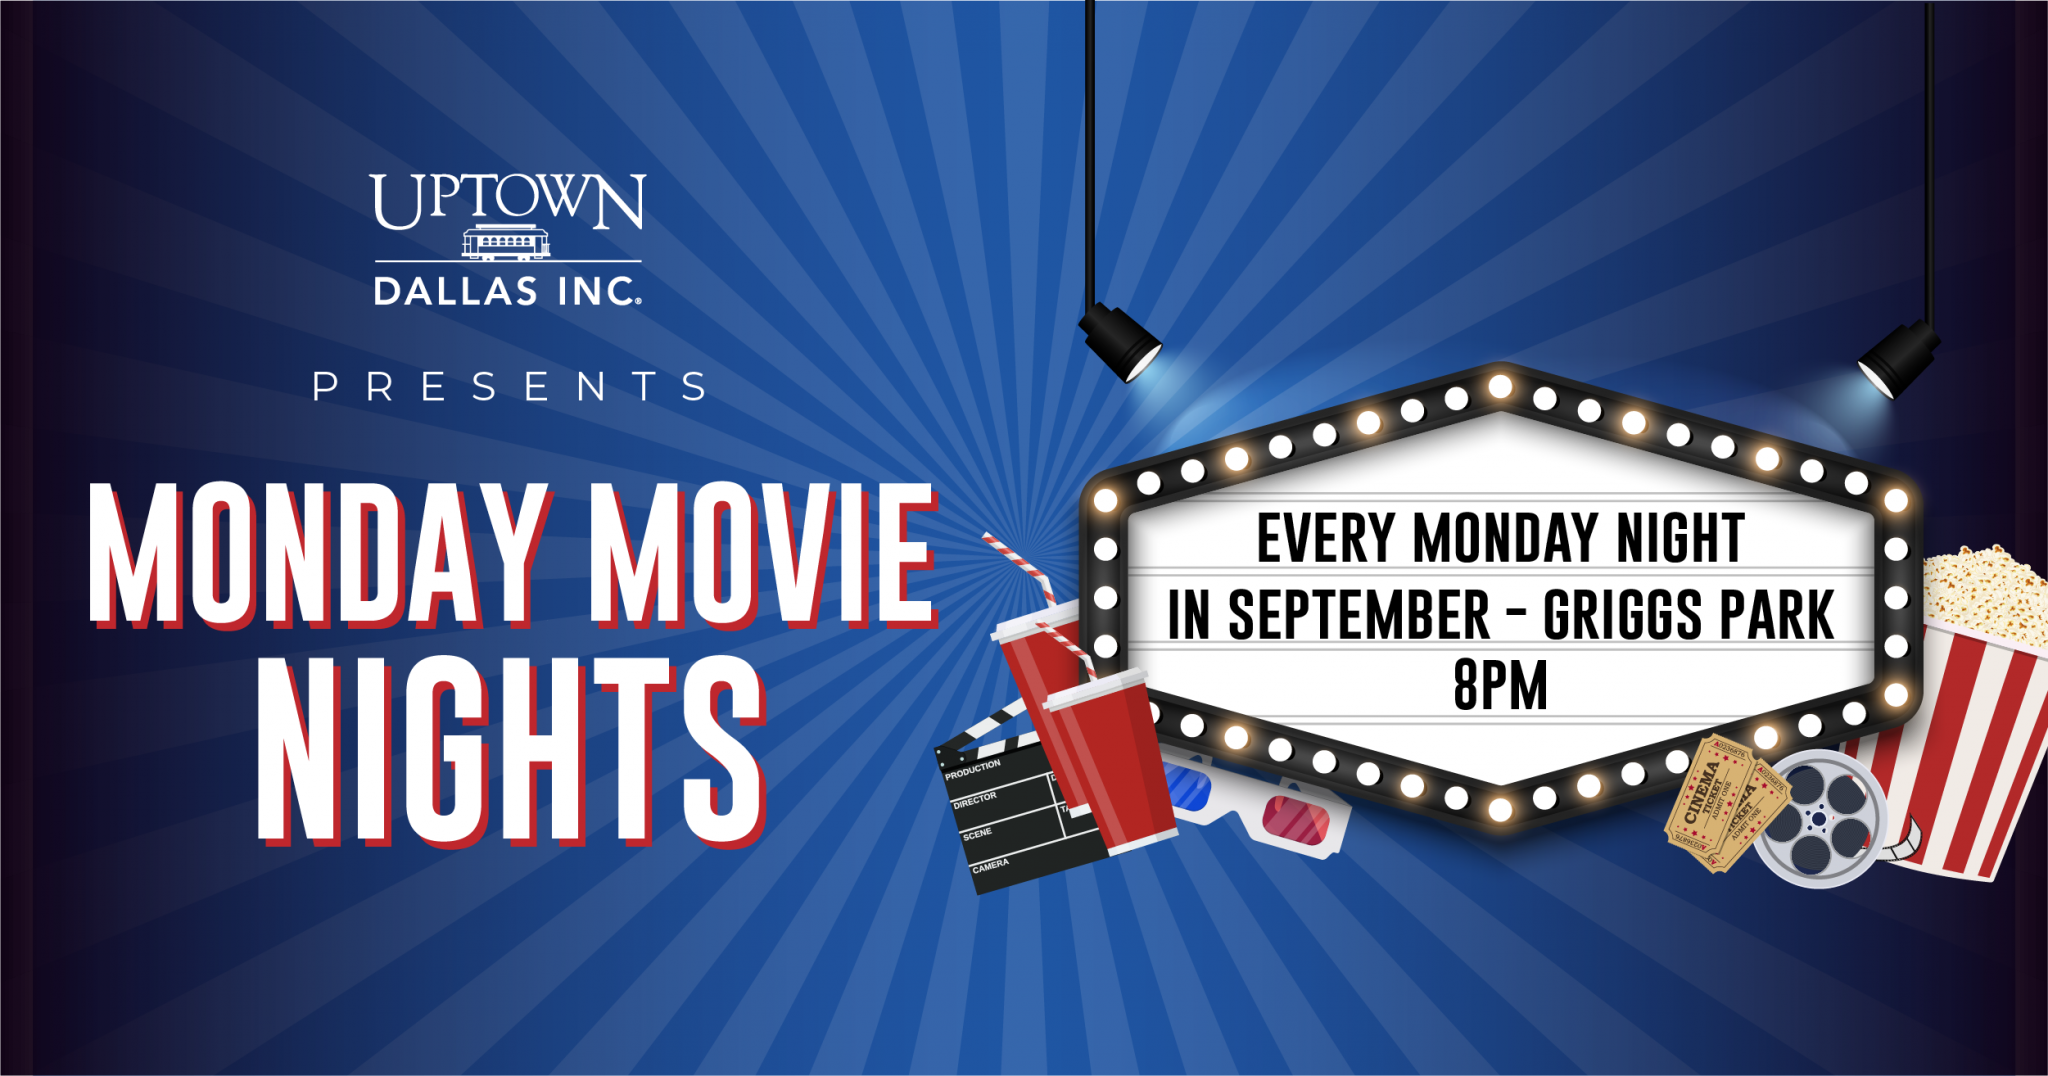 Uptown Dallas Monday Movie Nights